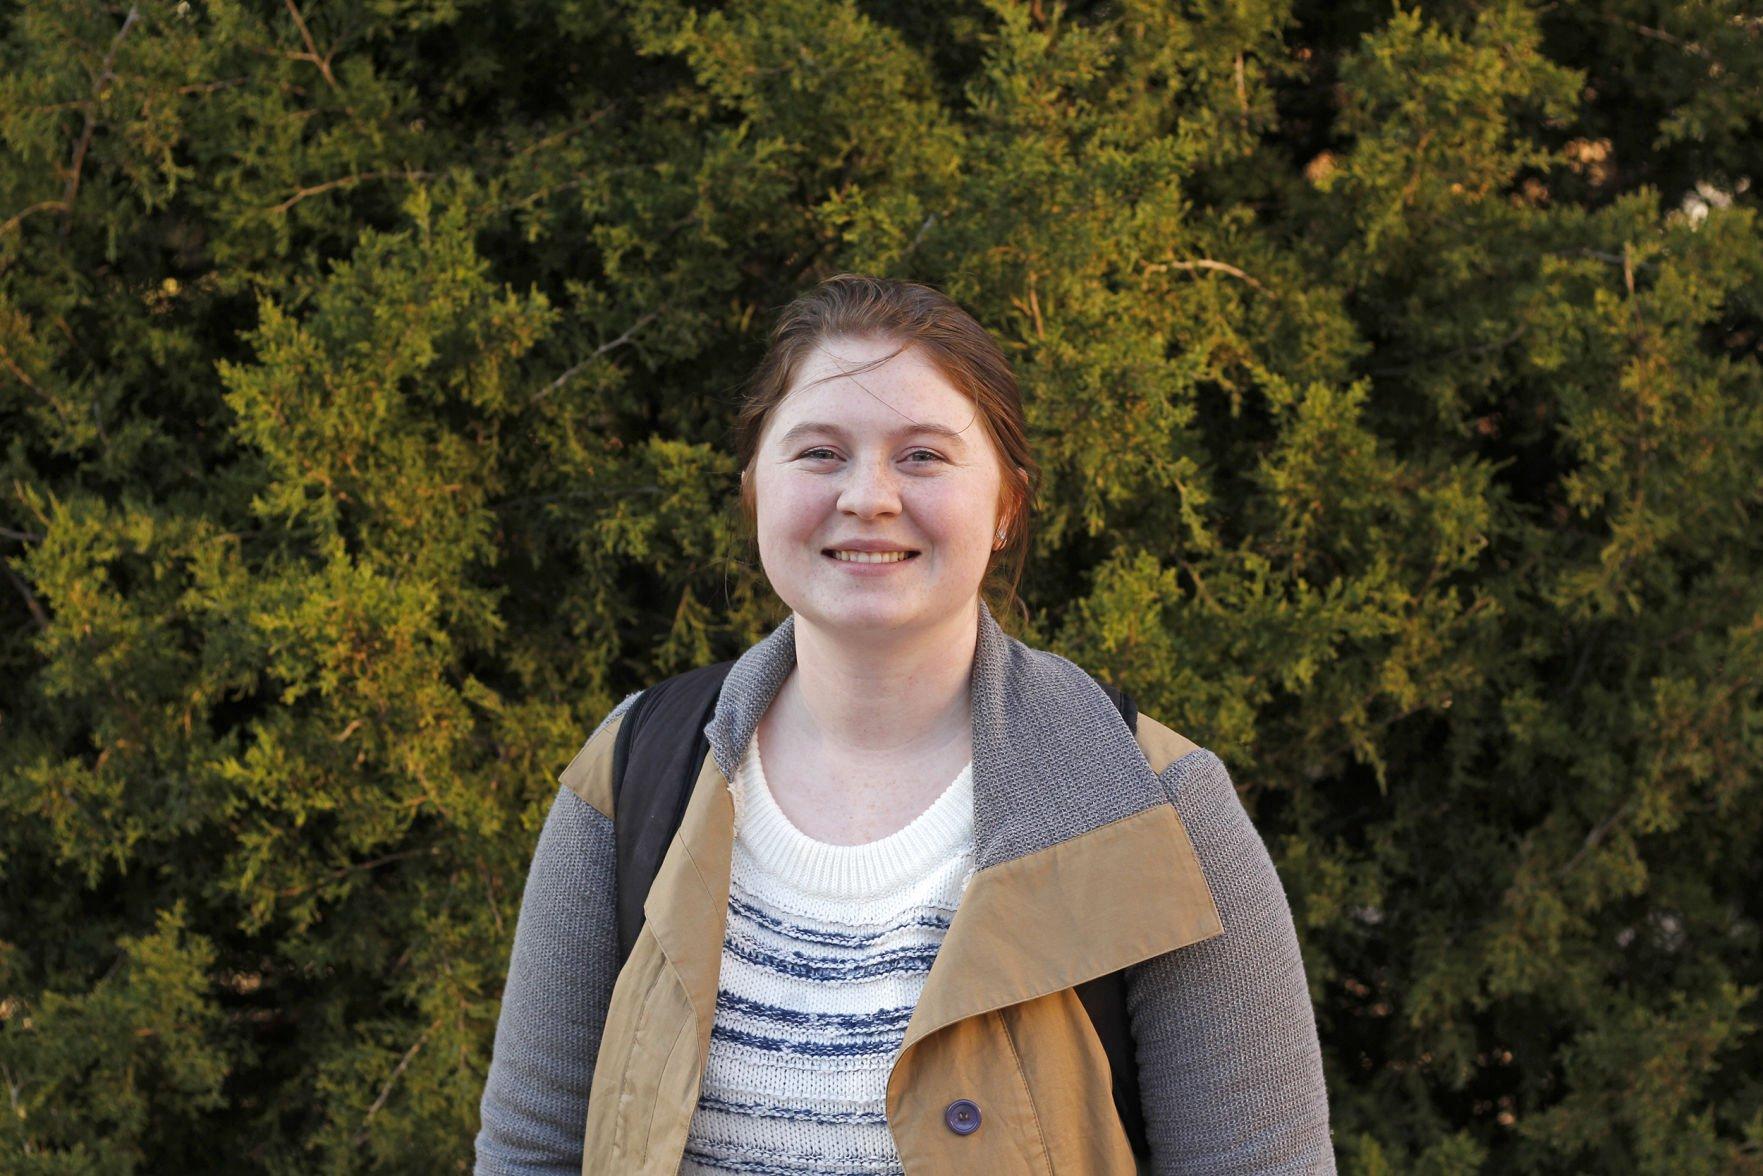 People of UTA: the students who shape UTA